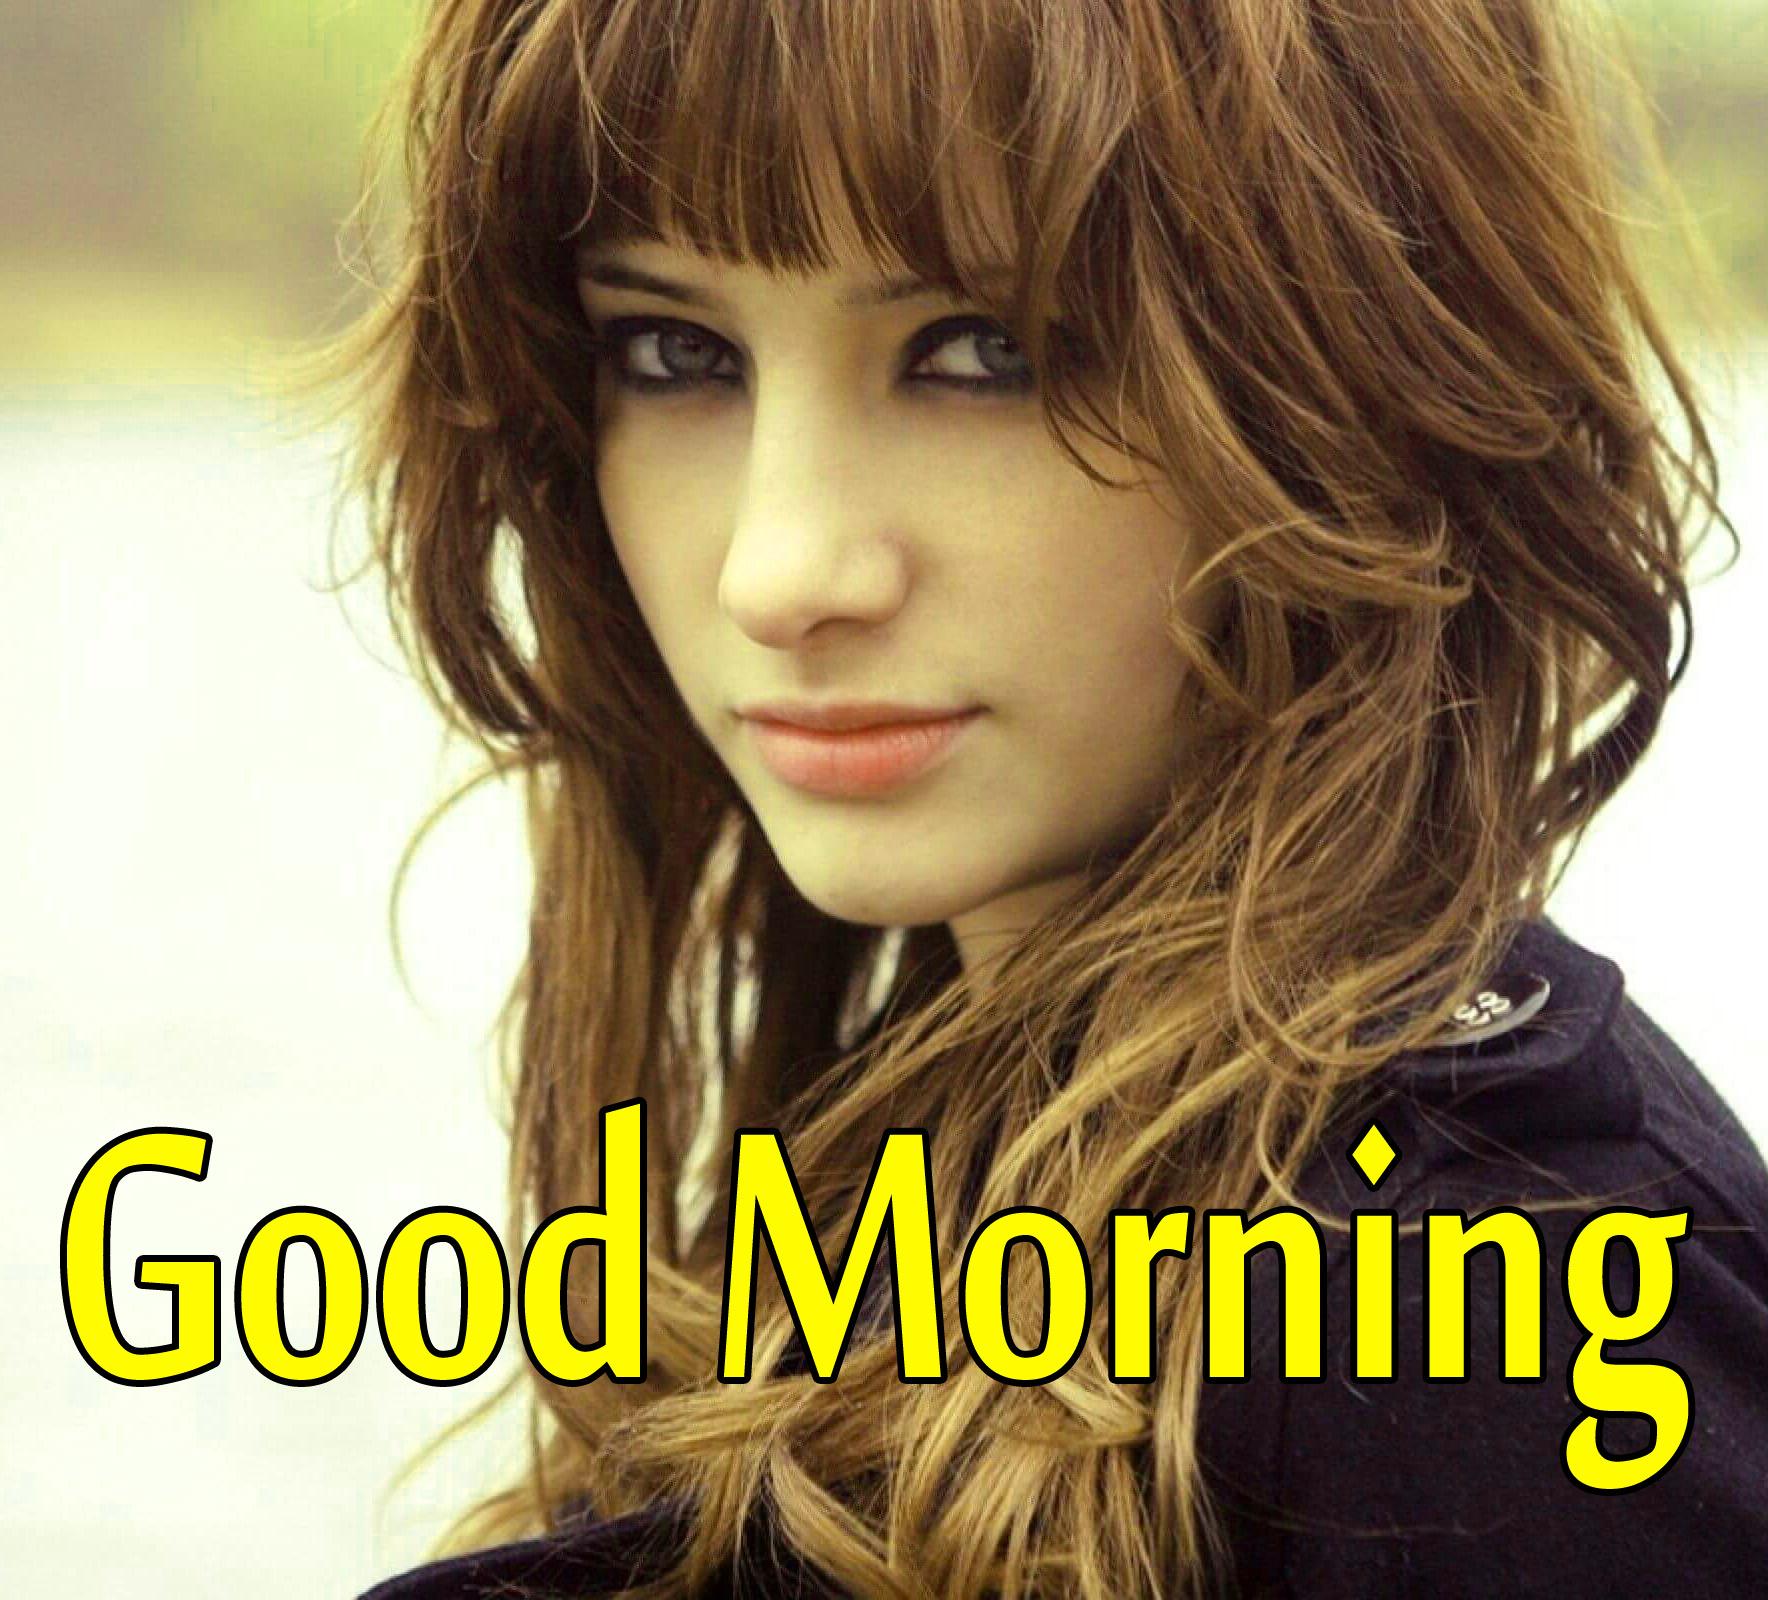 good morning Images for girls 19